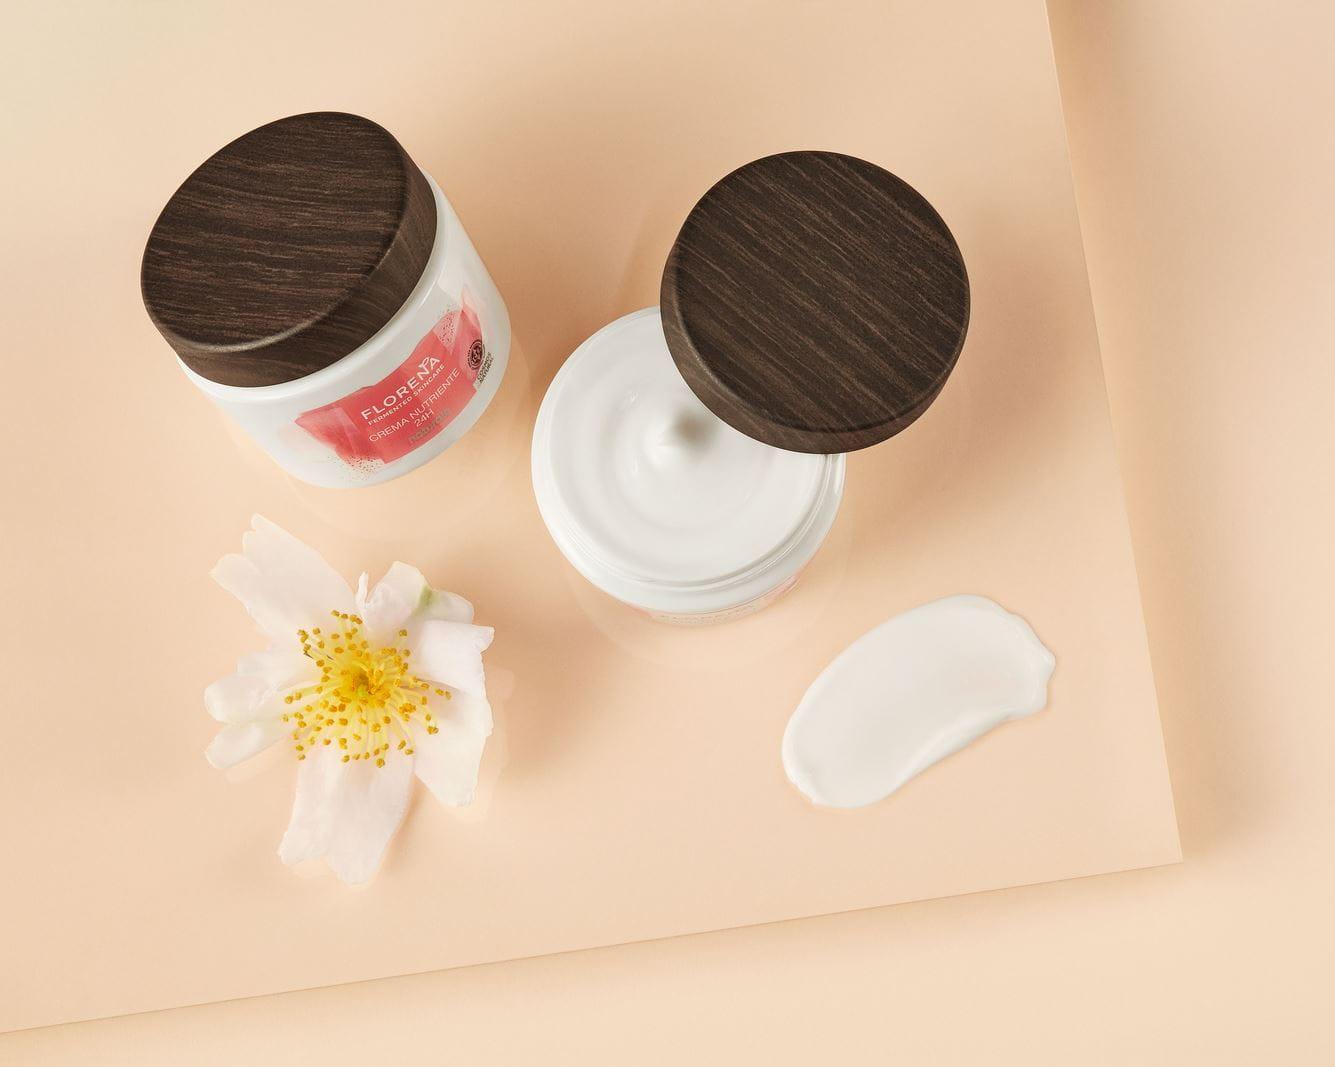 florena fermented moisturiser